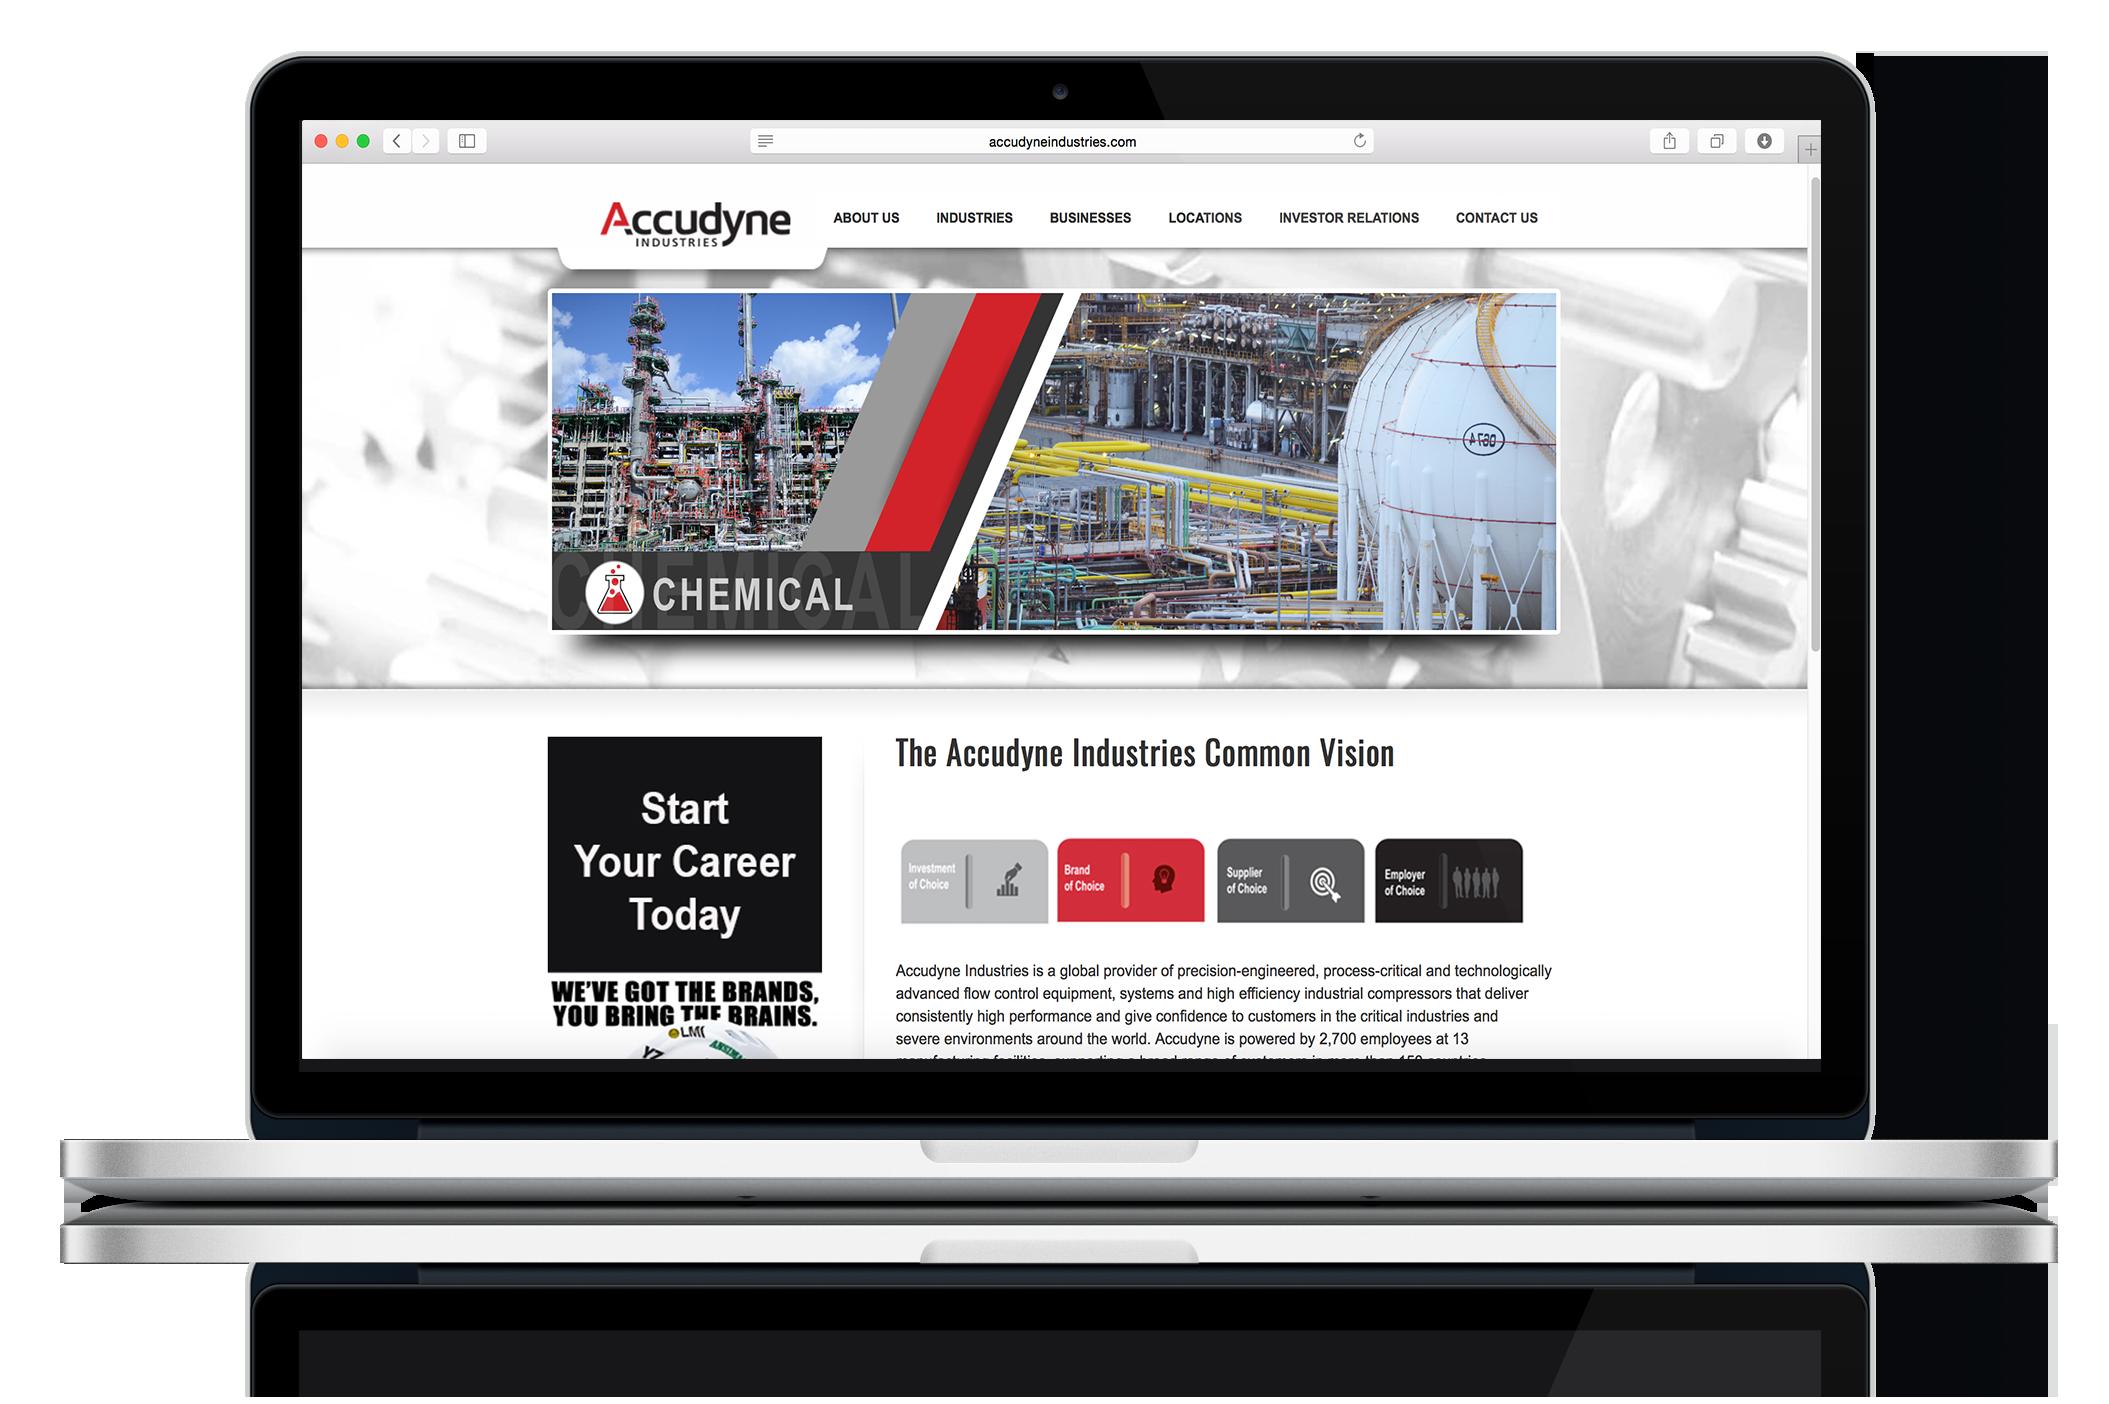 AccudyneIndustriesWebsite_Mockup1.png